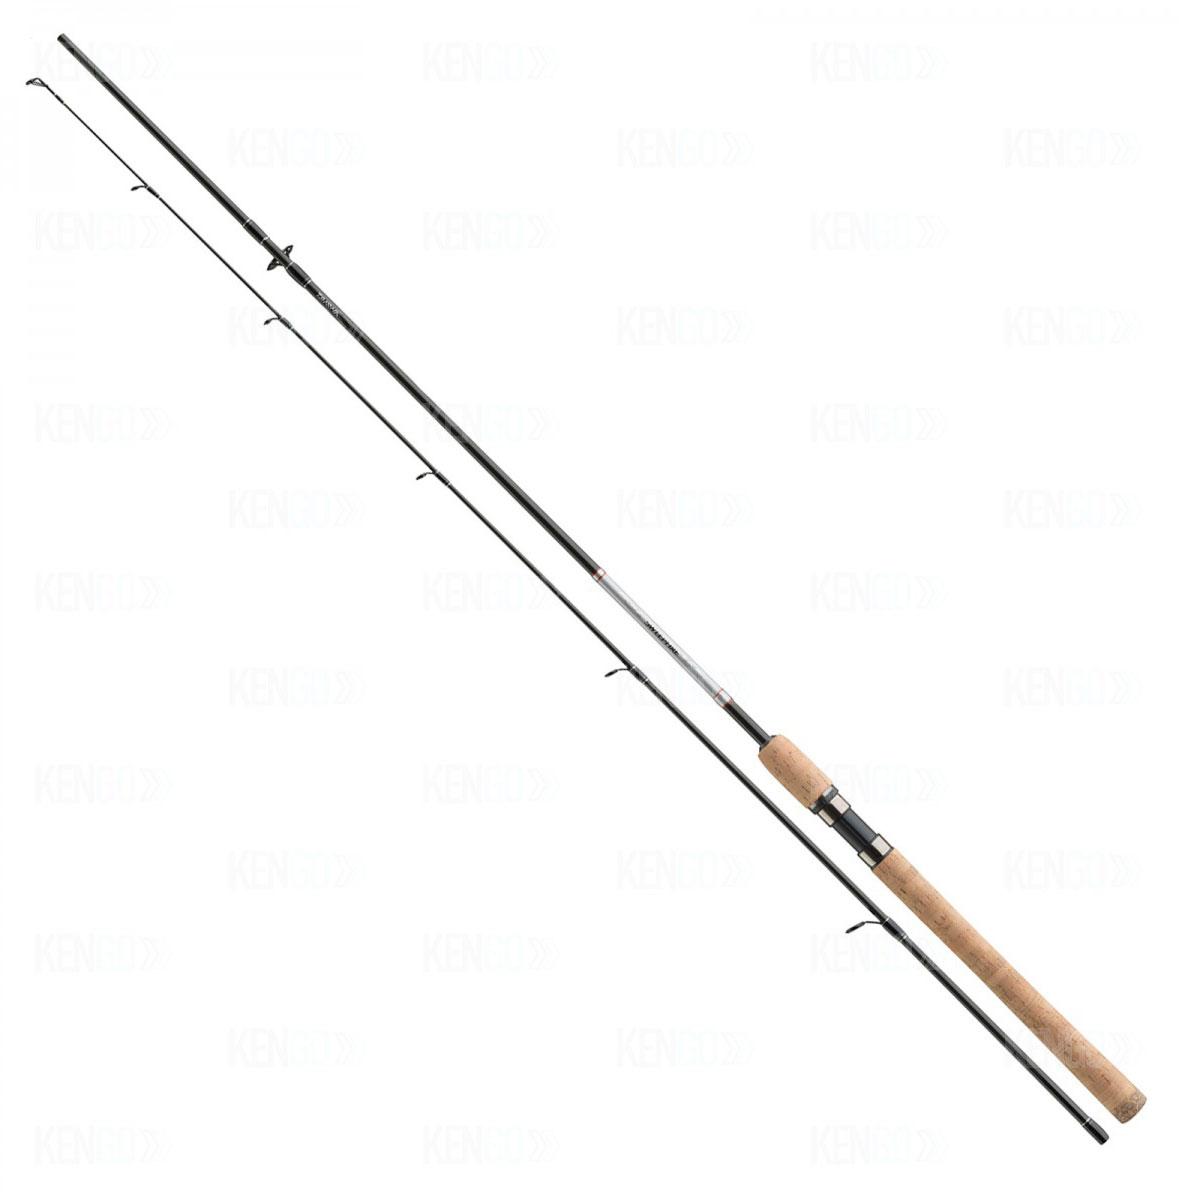 Спиннинг штекерный Daiwa Sweepfire, 2,4 м, 5-25 г удилище спиннинговое daiwa sweepfire sw902mlfs